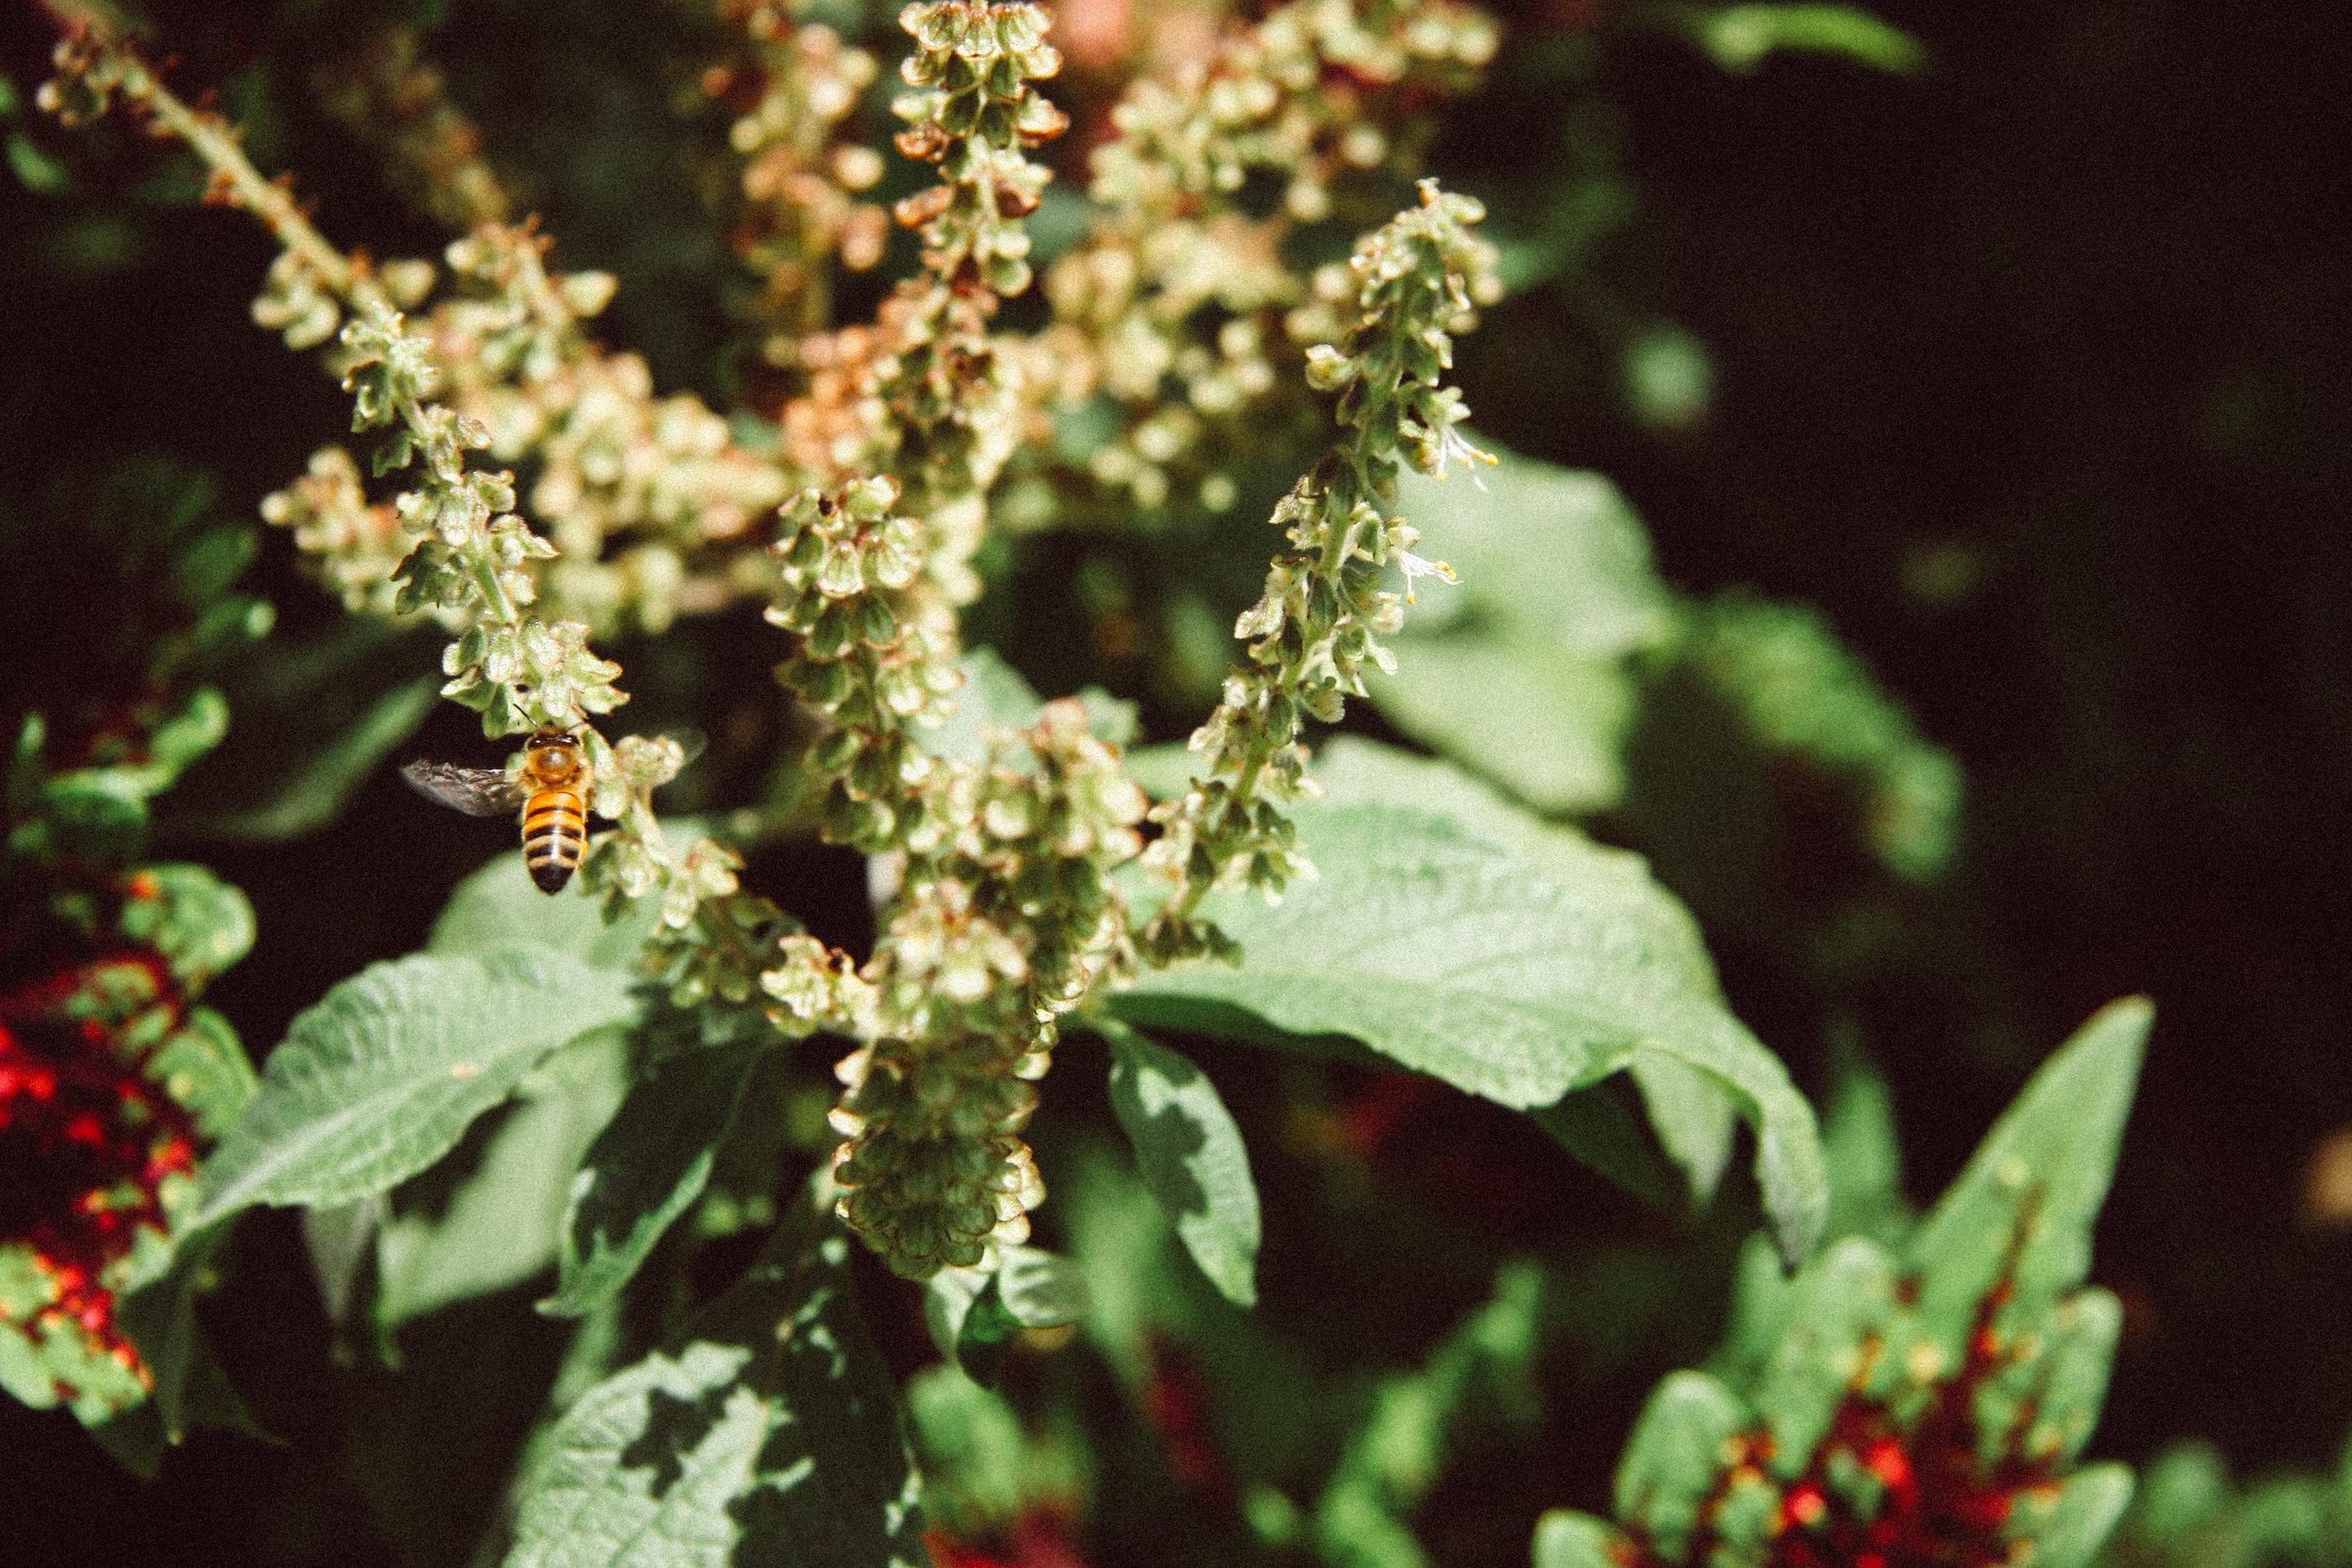 honeybee on a Bush/African Basil,  Ocimum gratissimum,  (Laminaceae)